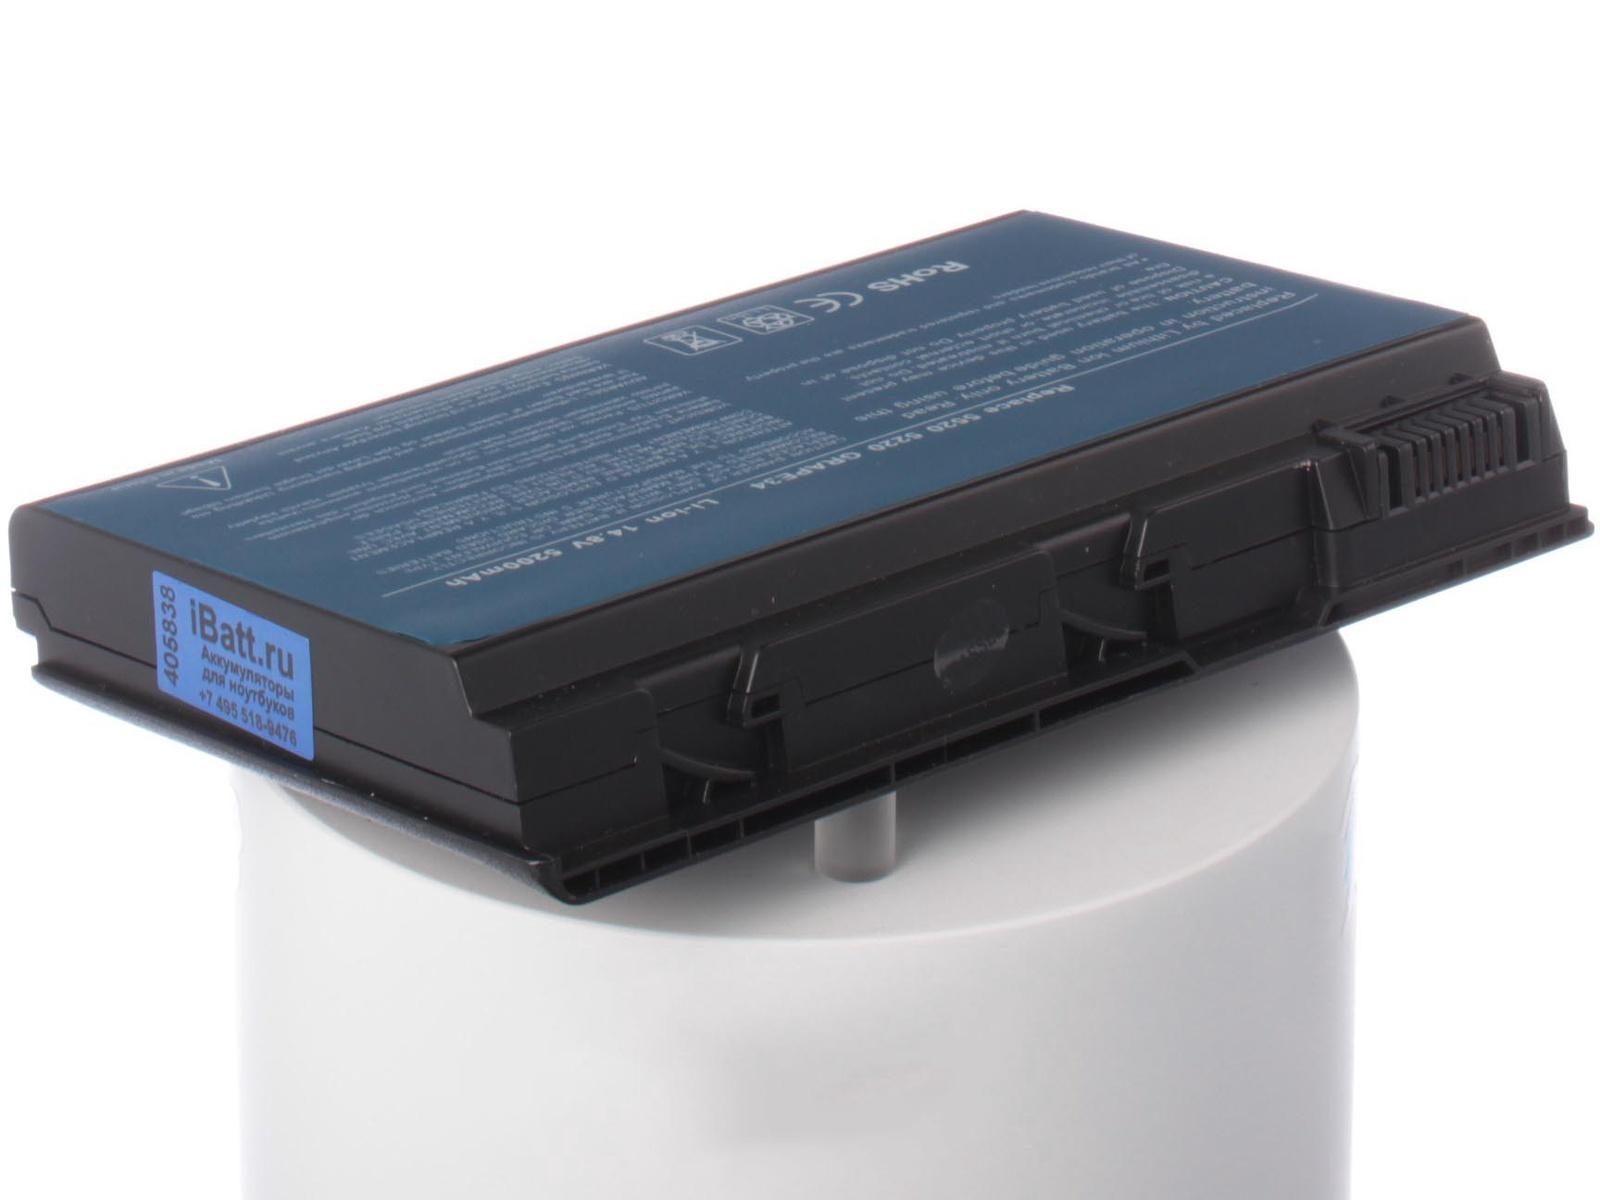 Аккумулятор для ноутбука iBatt для Acer TravelMate 5220, Extensa 5320, TravelMate 6463WLMi, TravelMate 7520, TravelMate 6410, TravelMate 7520G, TravelMate 6463, Extensa 5630EZ-422G16Mi, Extensa 7520, Extensa 5620G-2A2G16Mi jigu battery for acer extensa 5220 5235 5620 5630 7620 travelmate 5320 5520 5720 7720 7520 6592 tm00741 tm00751 grape32